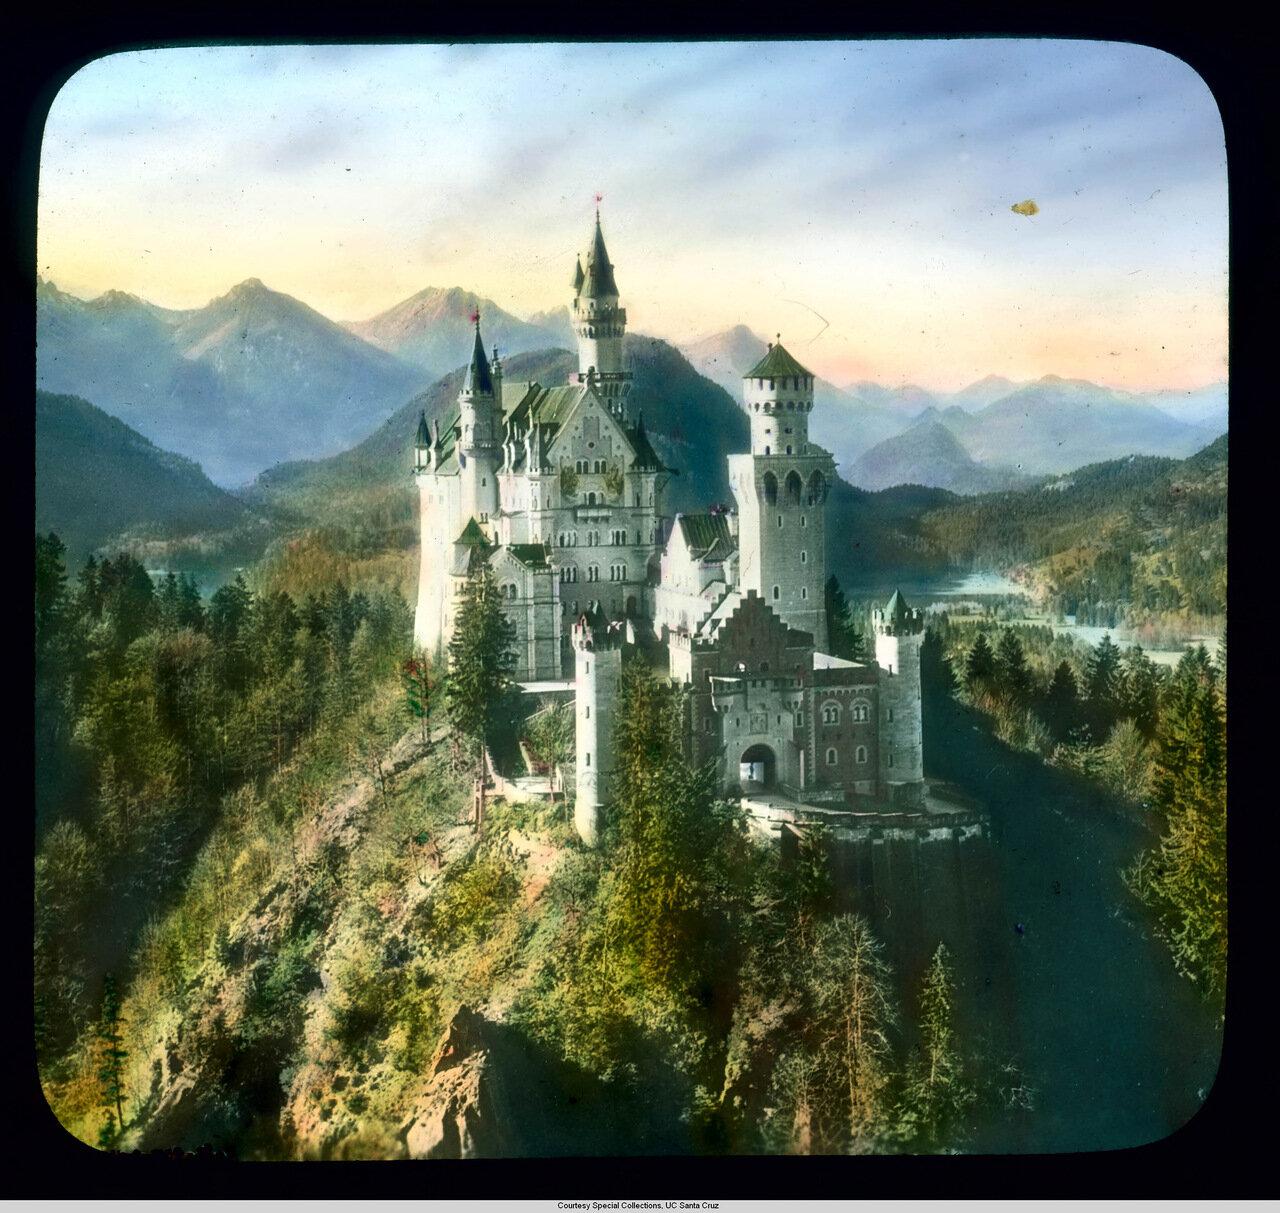 Бавария. Дворец Нойшванштайн. Вид с воздуха